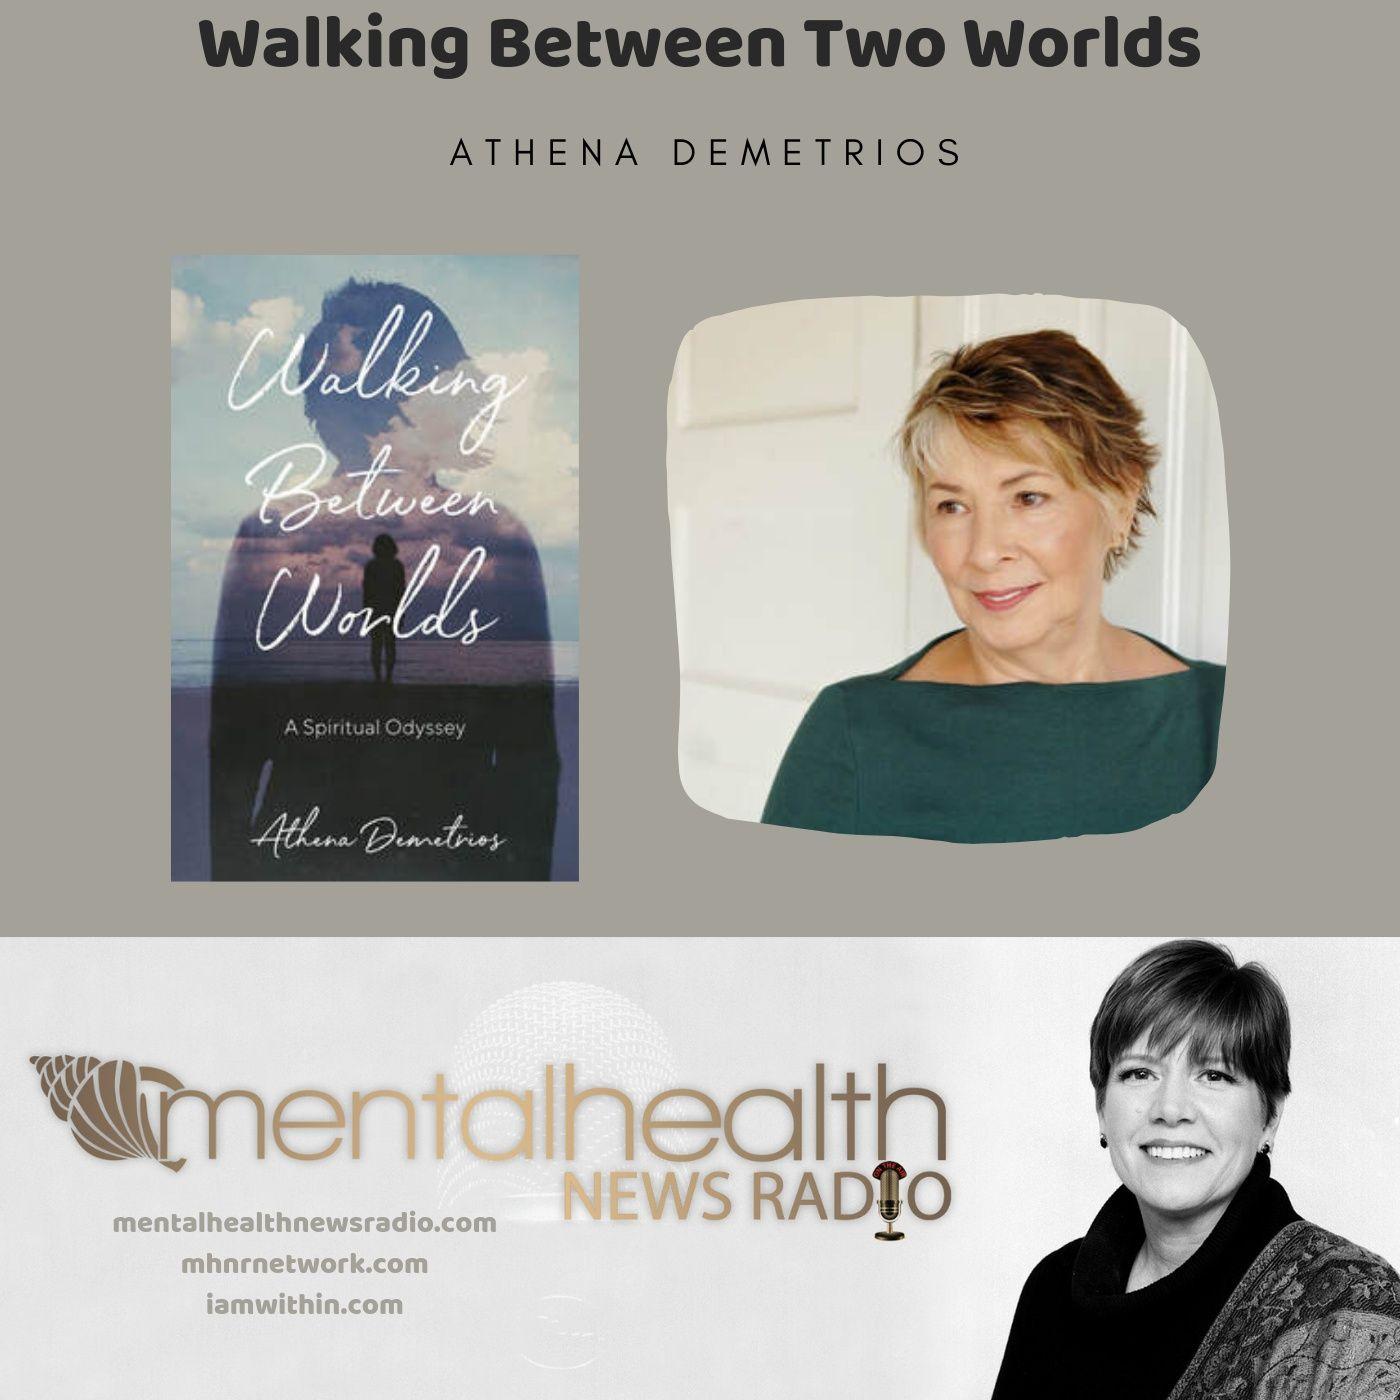 Mental Health News Radio - Walking Between Worlds with Athena Demetrios